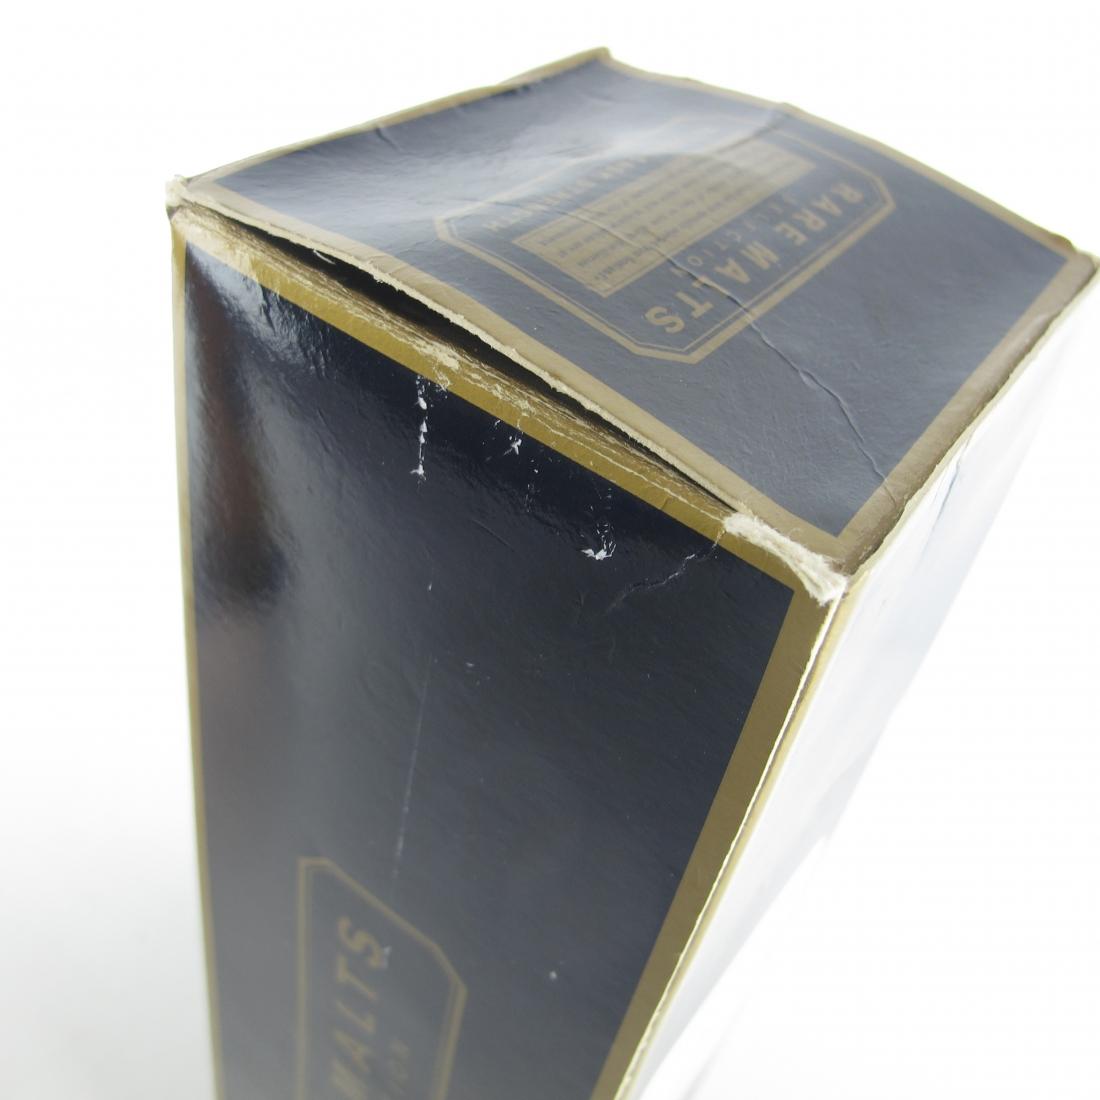 Caol Ila 1978 Rare Malt 23 Year Old / 61.7%